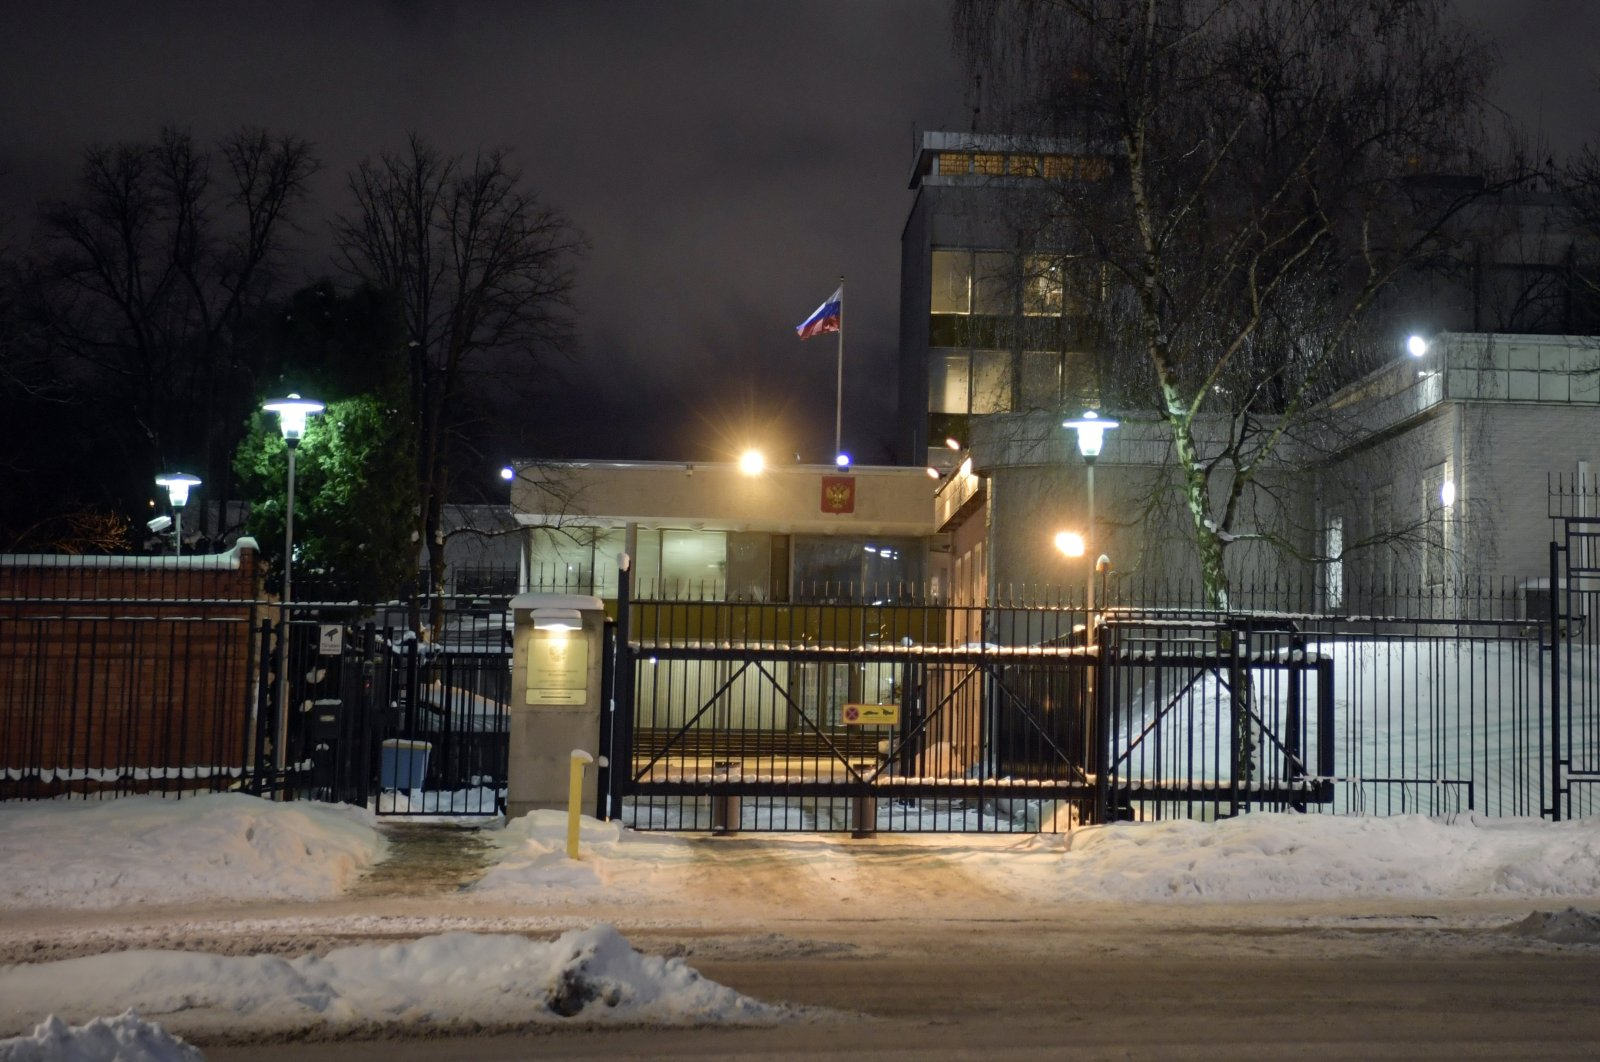 A general view of the Russian embassy in Stockholm, Sweden, Feb. 8, 2021. (Janerik Henriksson/TT News Agency via AP)